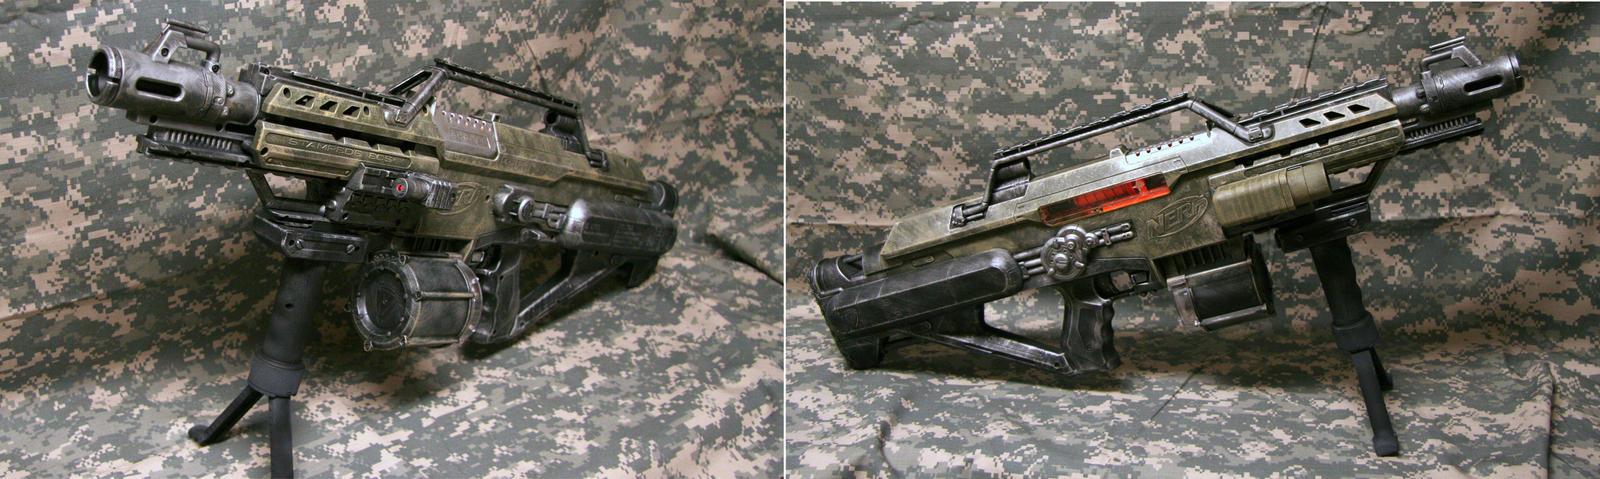 Ultra Custom Nerf Stampede by JohnsonArms